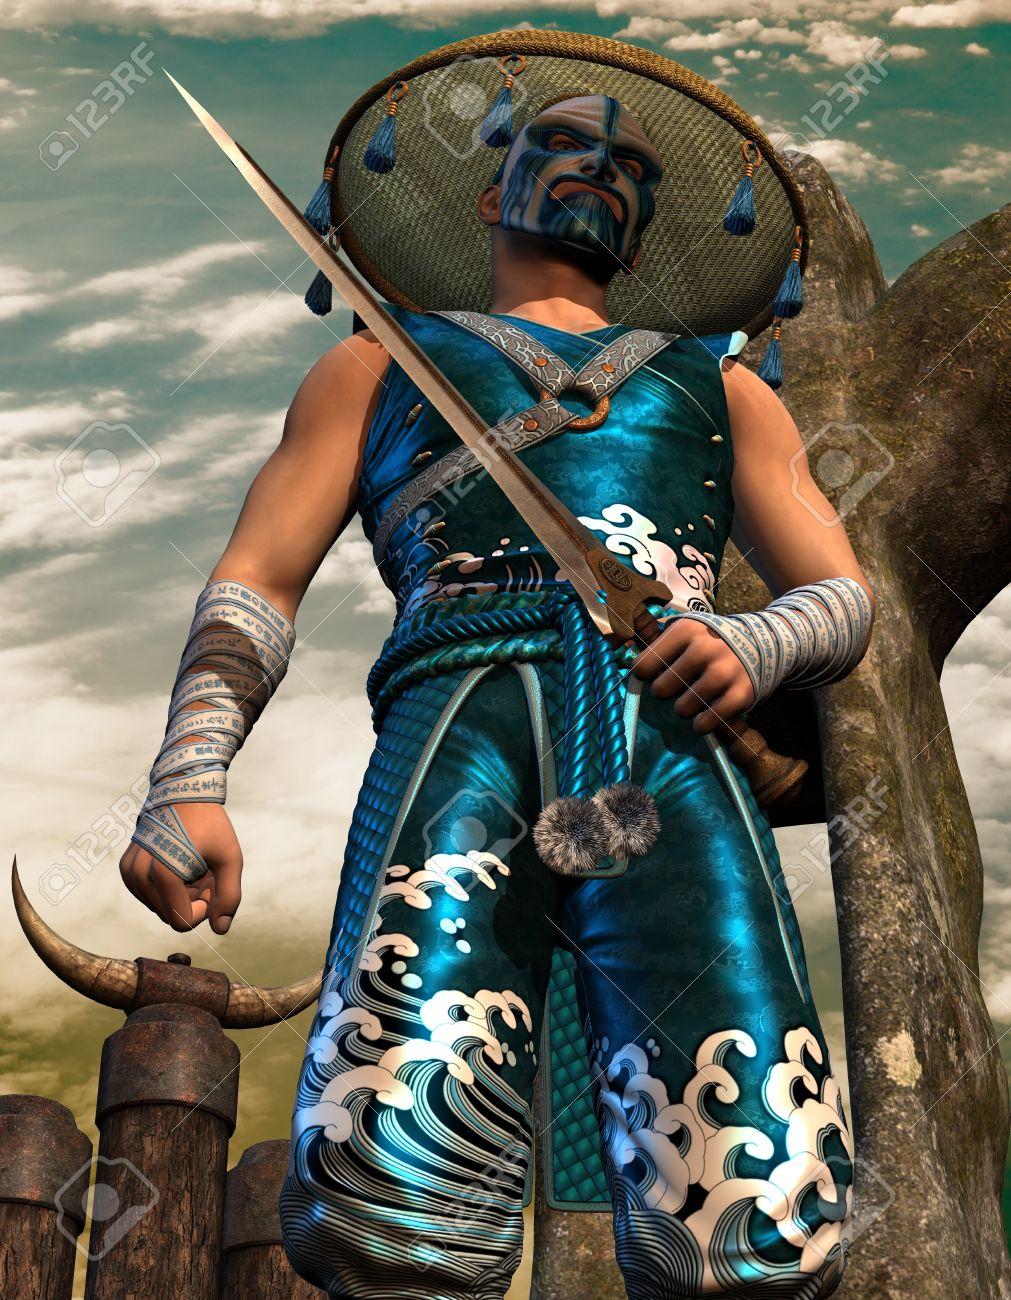 3D Rendering sword fighter in samurai clothing Stock Photo - 10871052